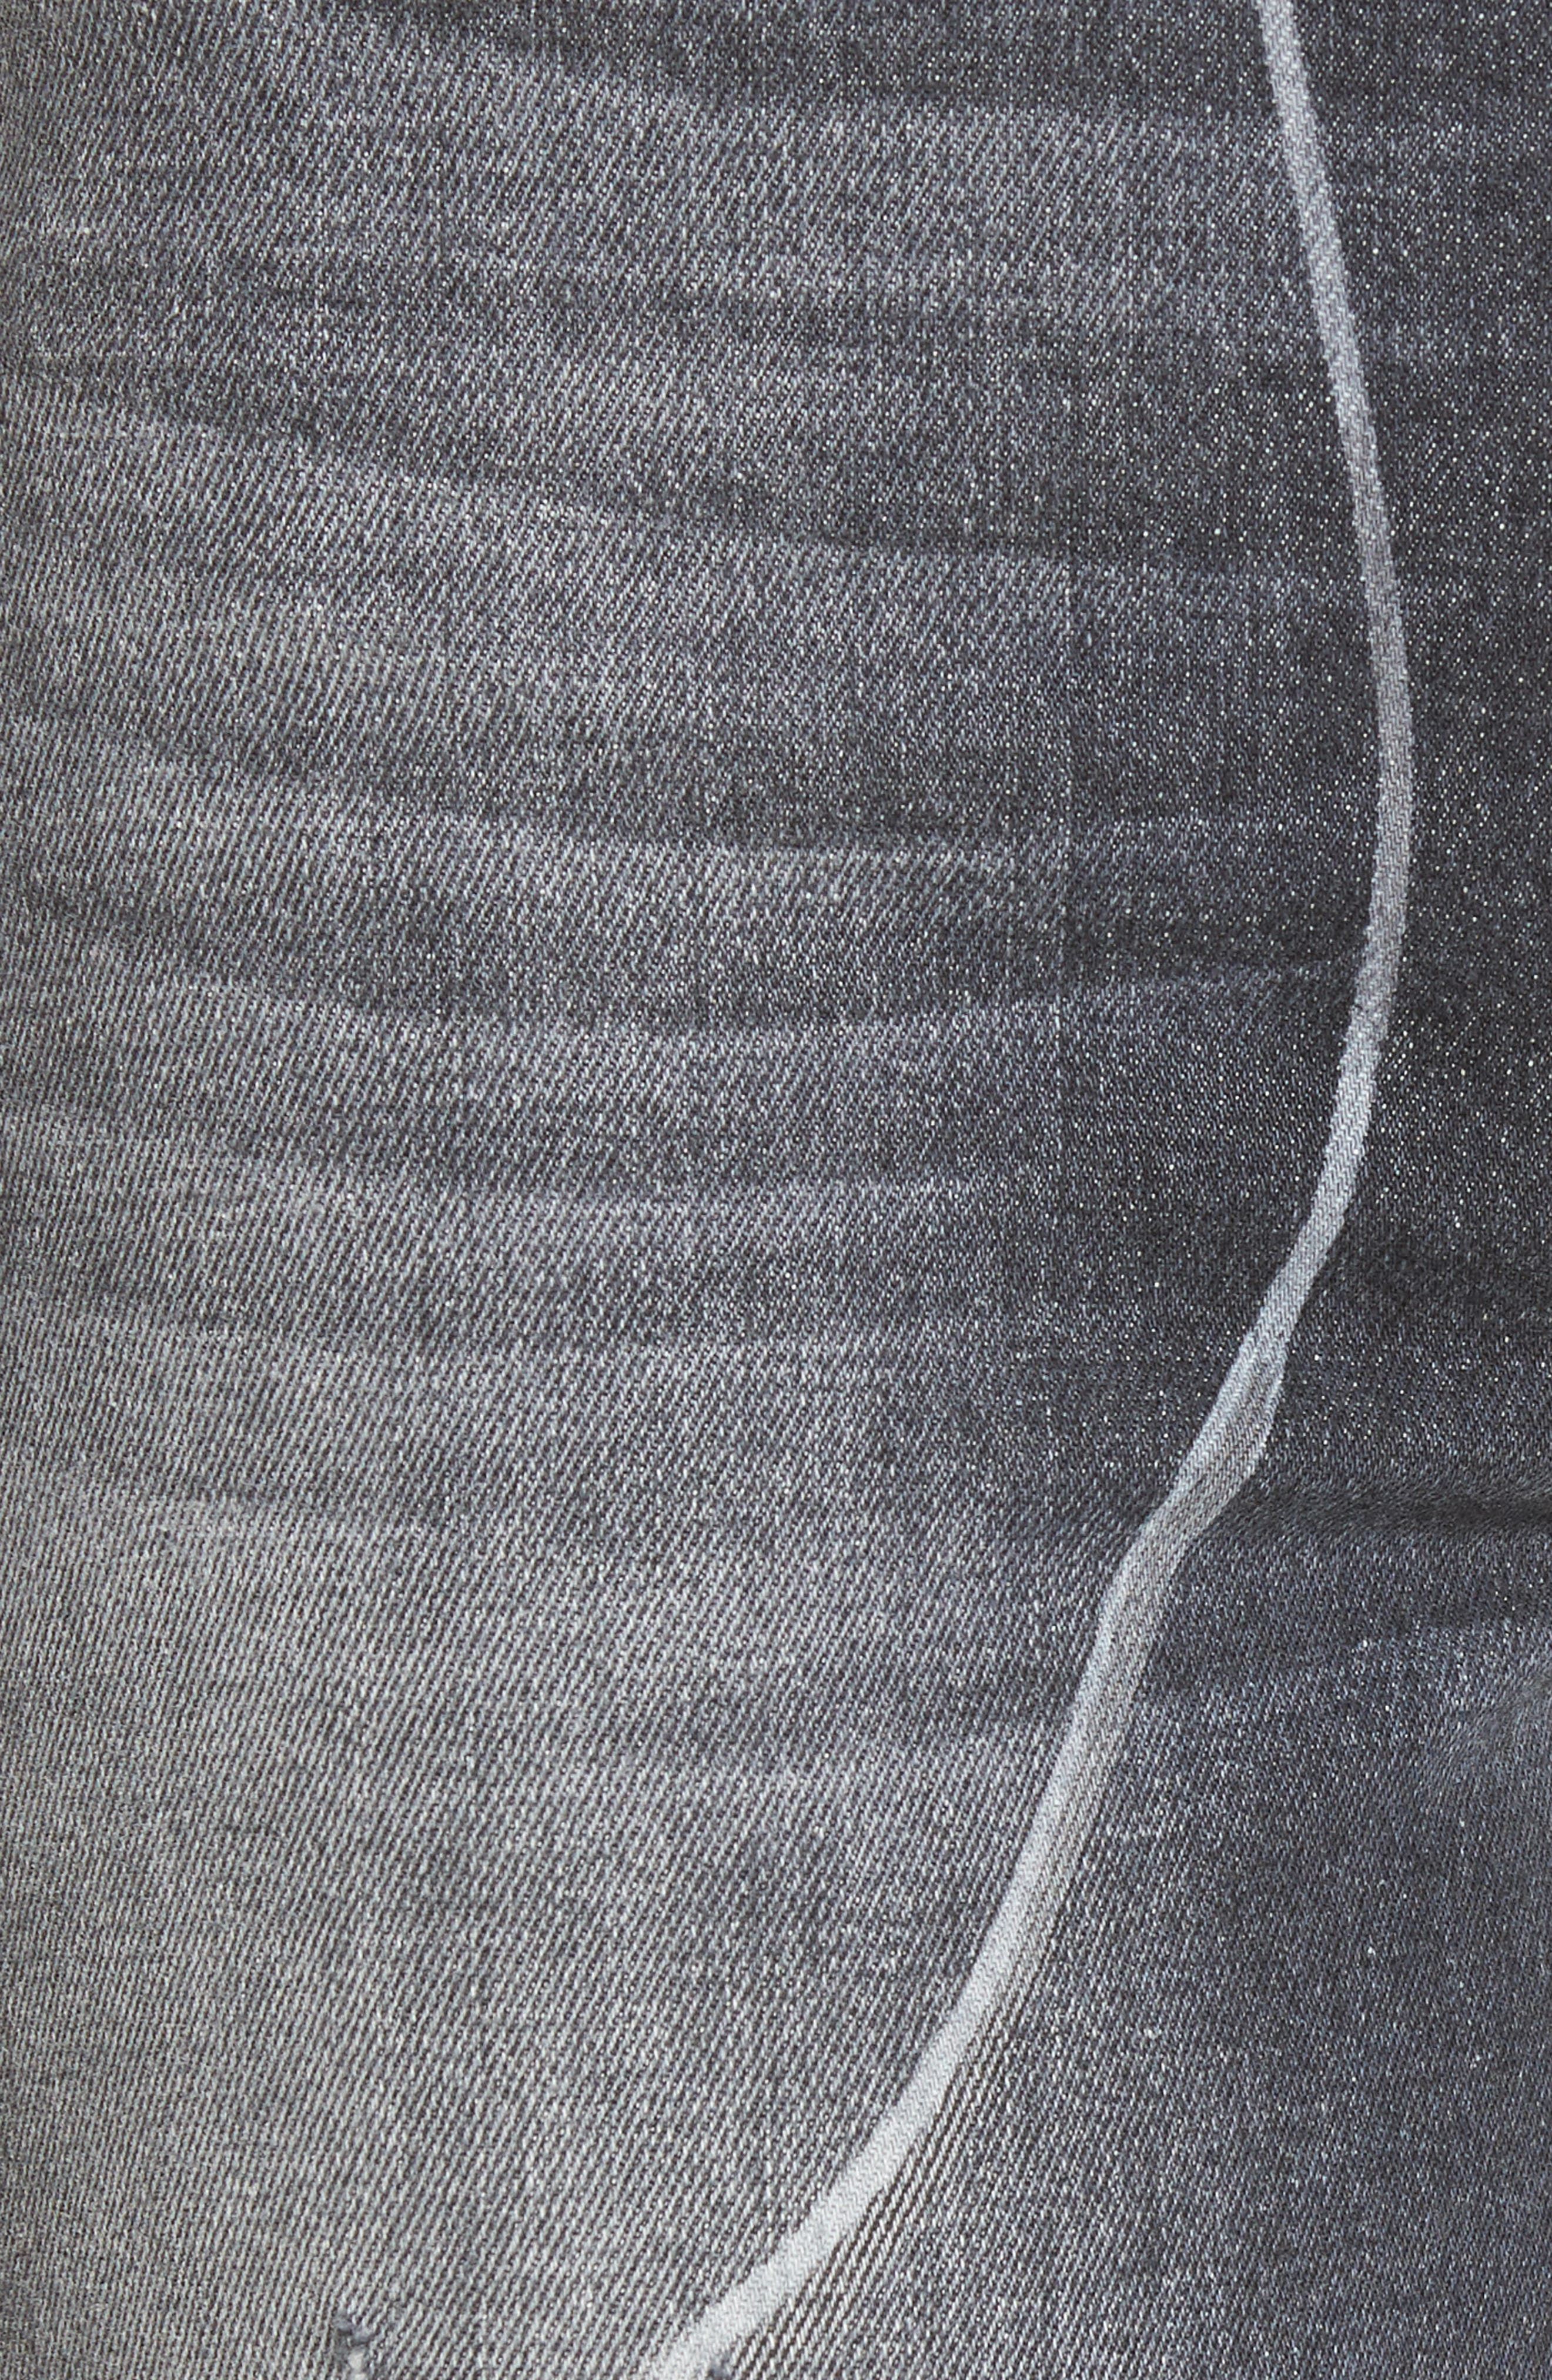 Zoeey High Waist Crop Straight Leg Jeans,                             Alternate thumbnail 5, color,                             Noir In Bloom